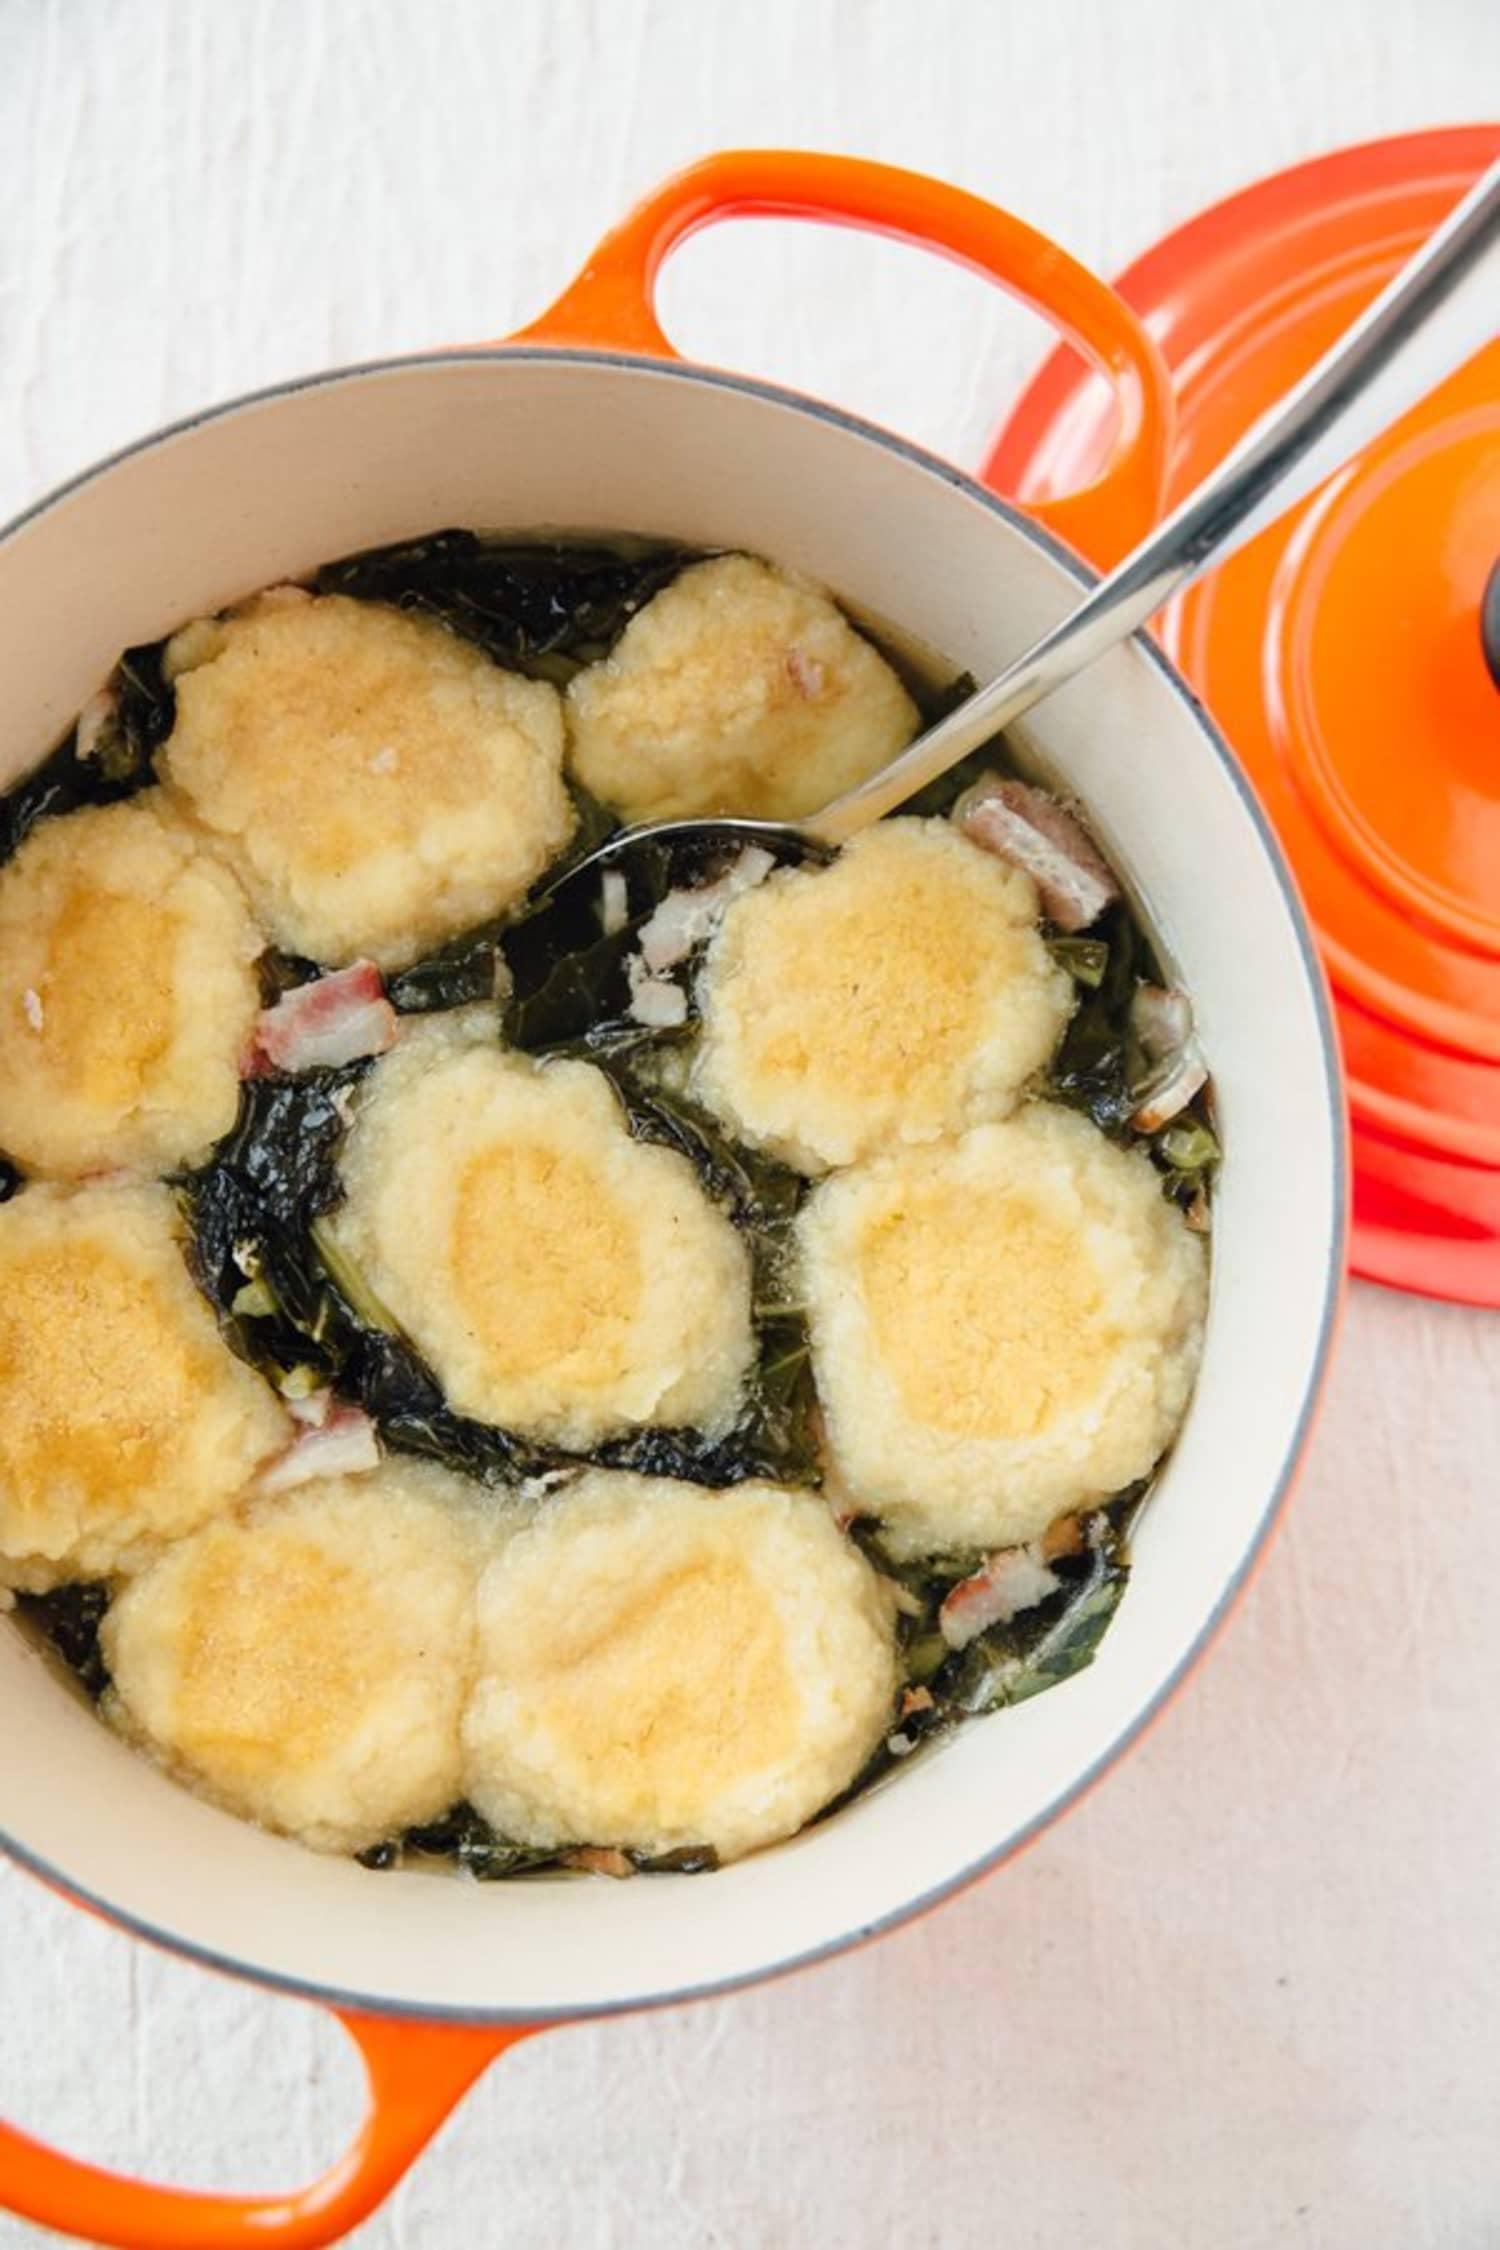 Recipe: Collard Greens with Pot Likker and Dumplings